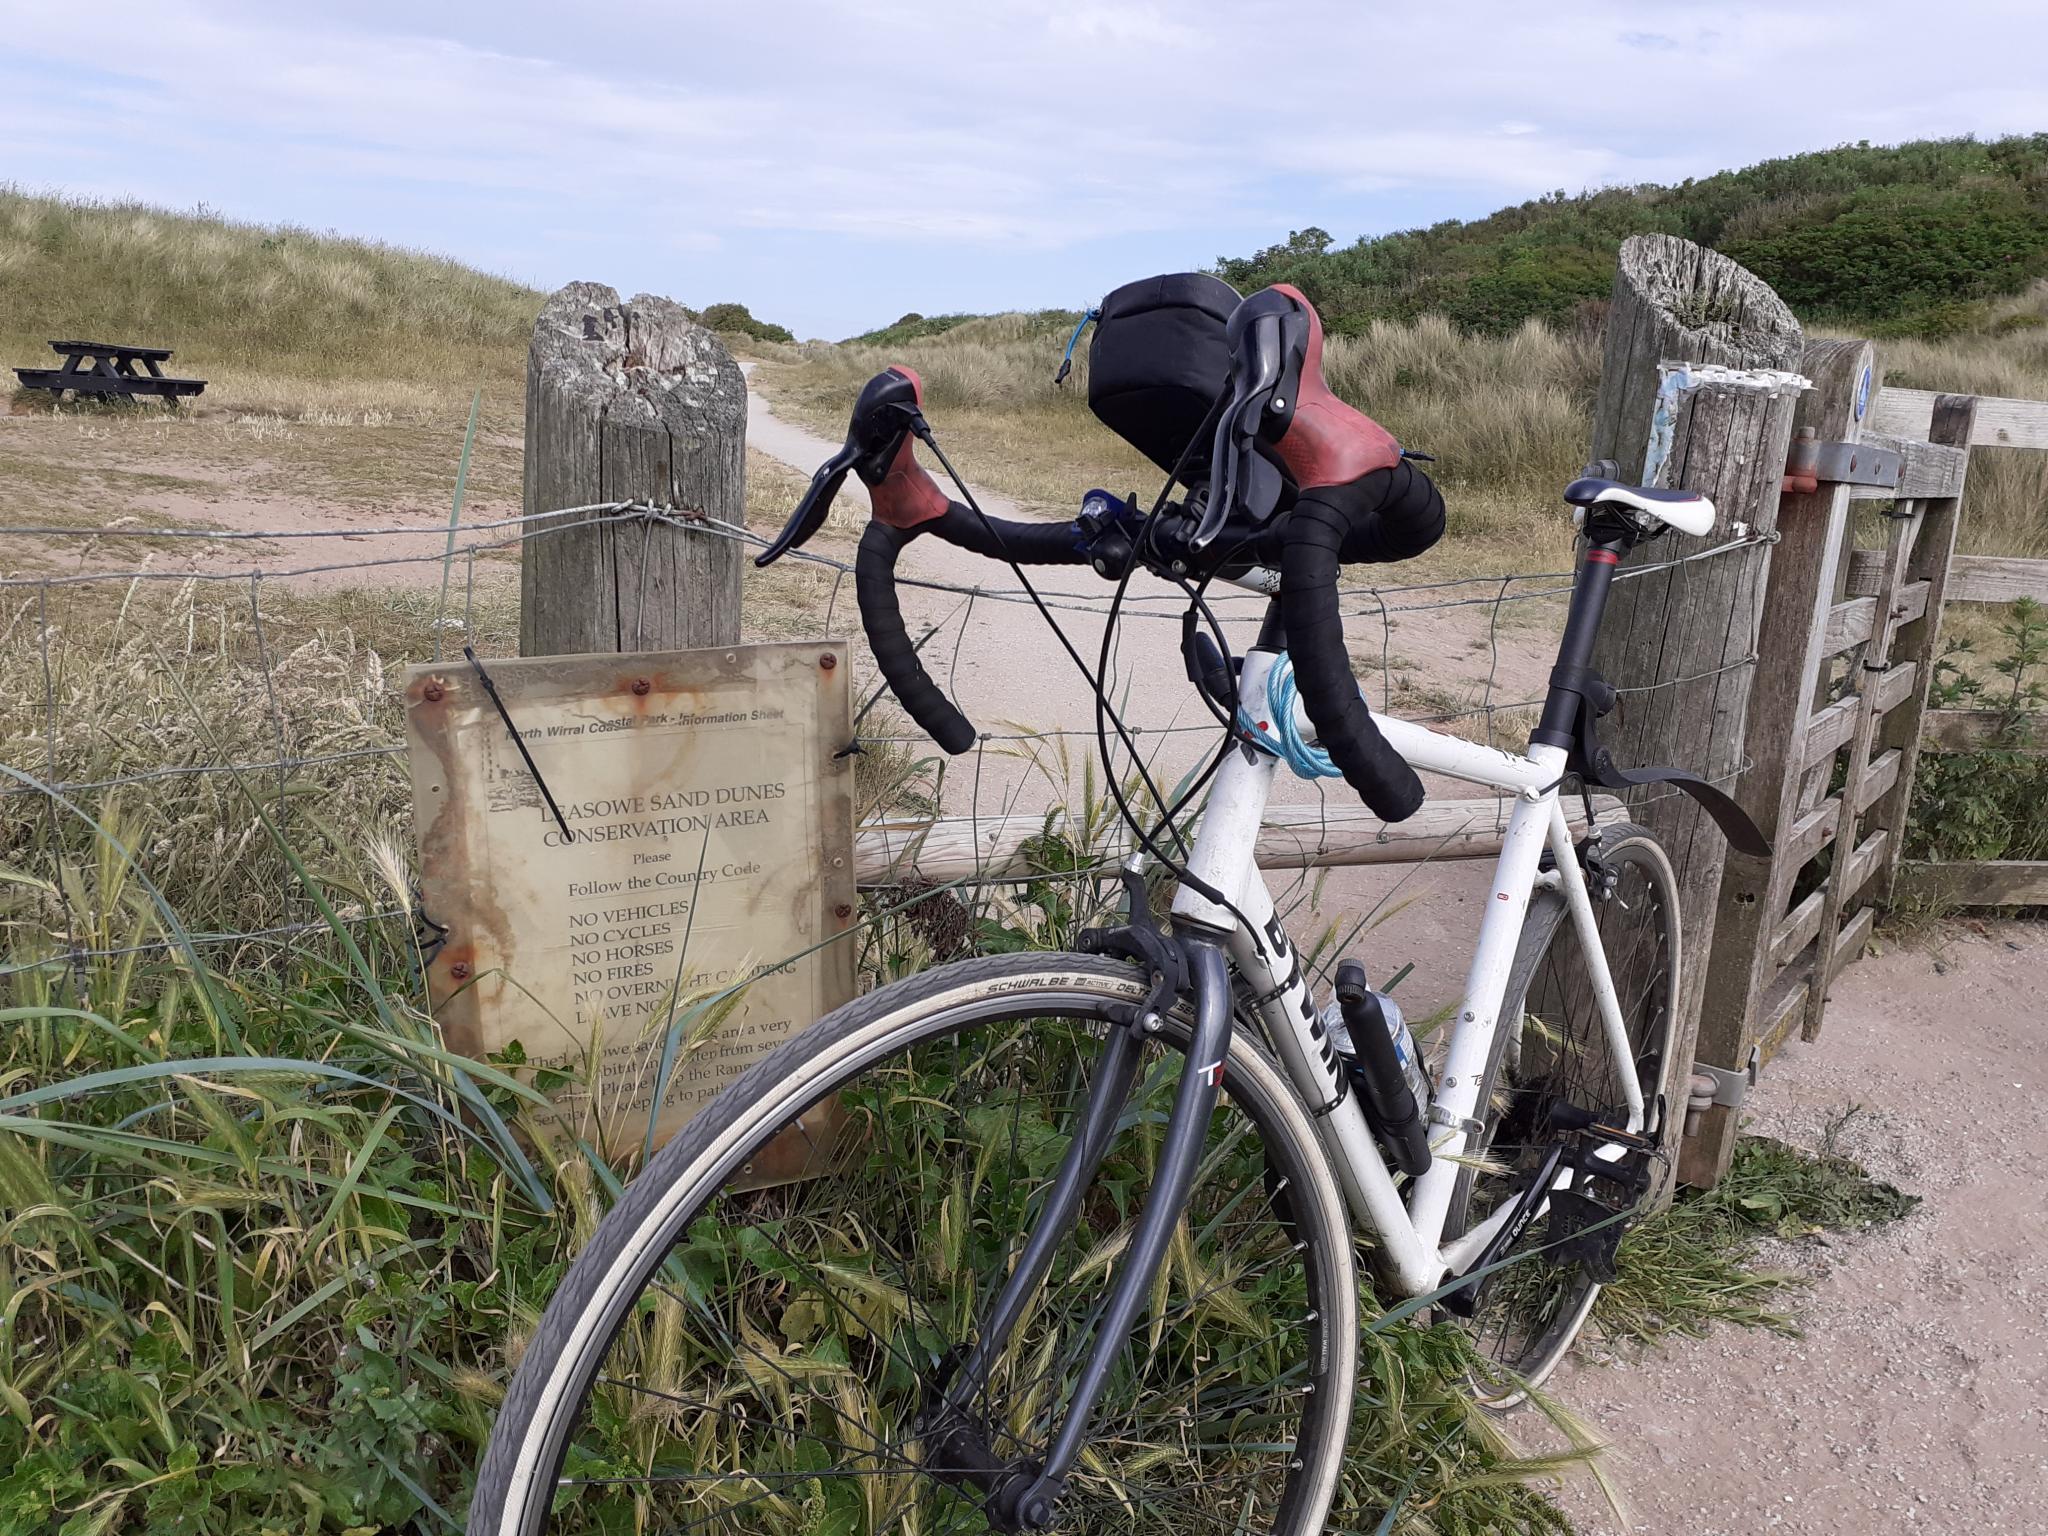 On my bike-20210615_162246-jpg